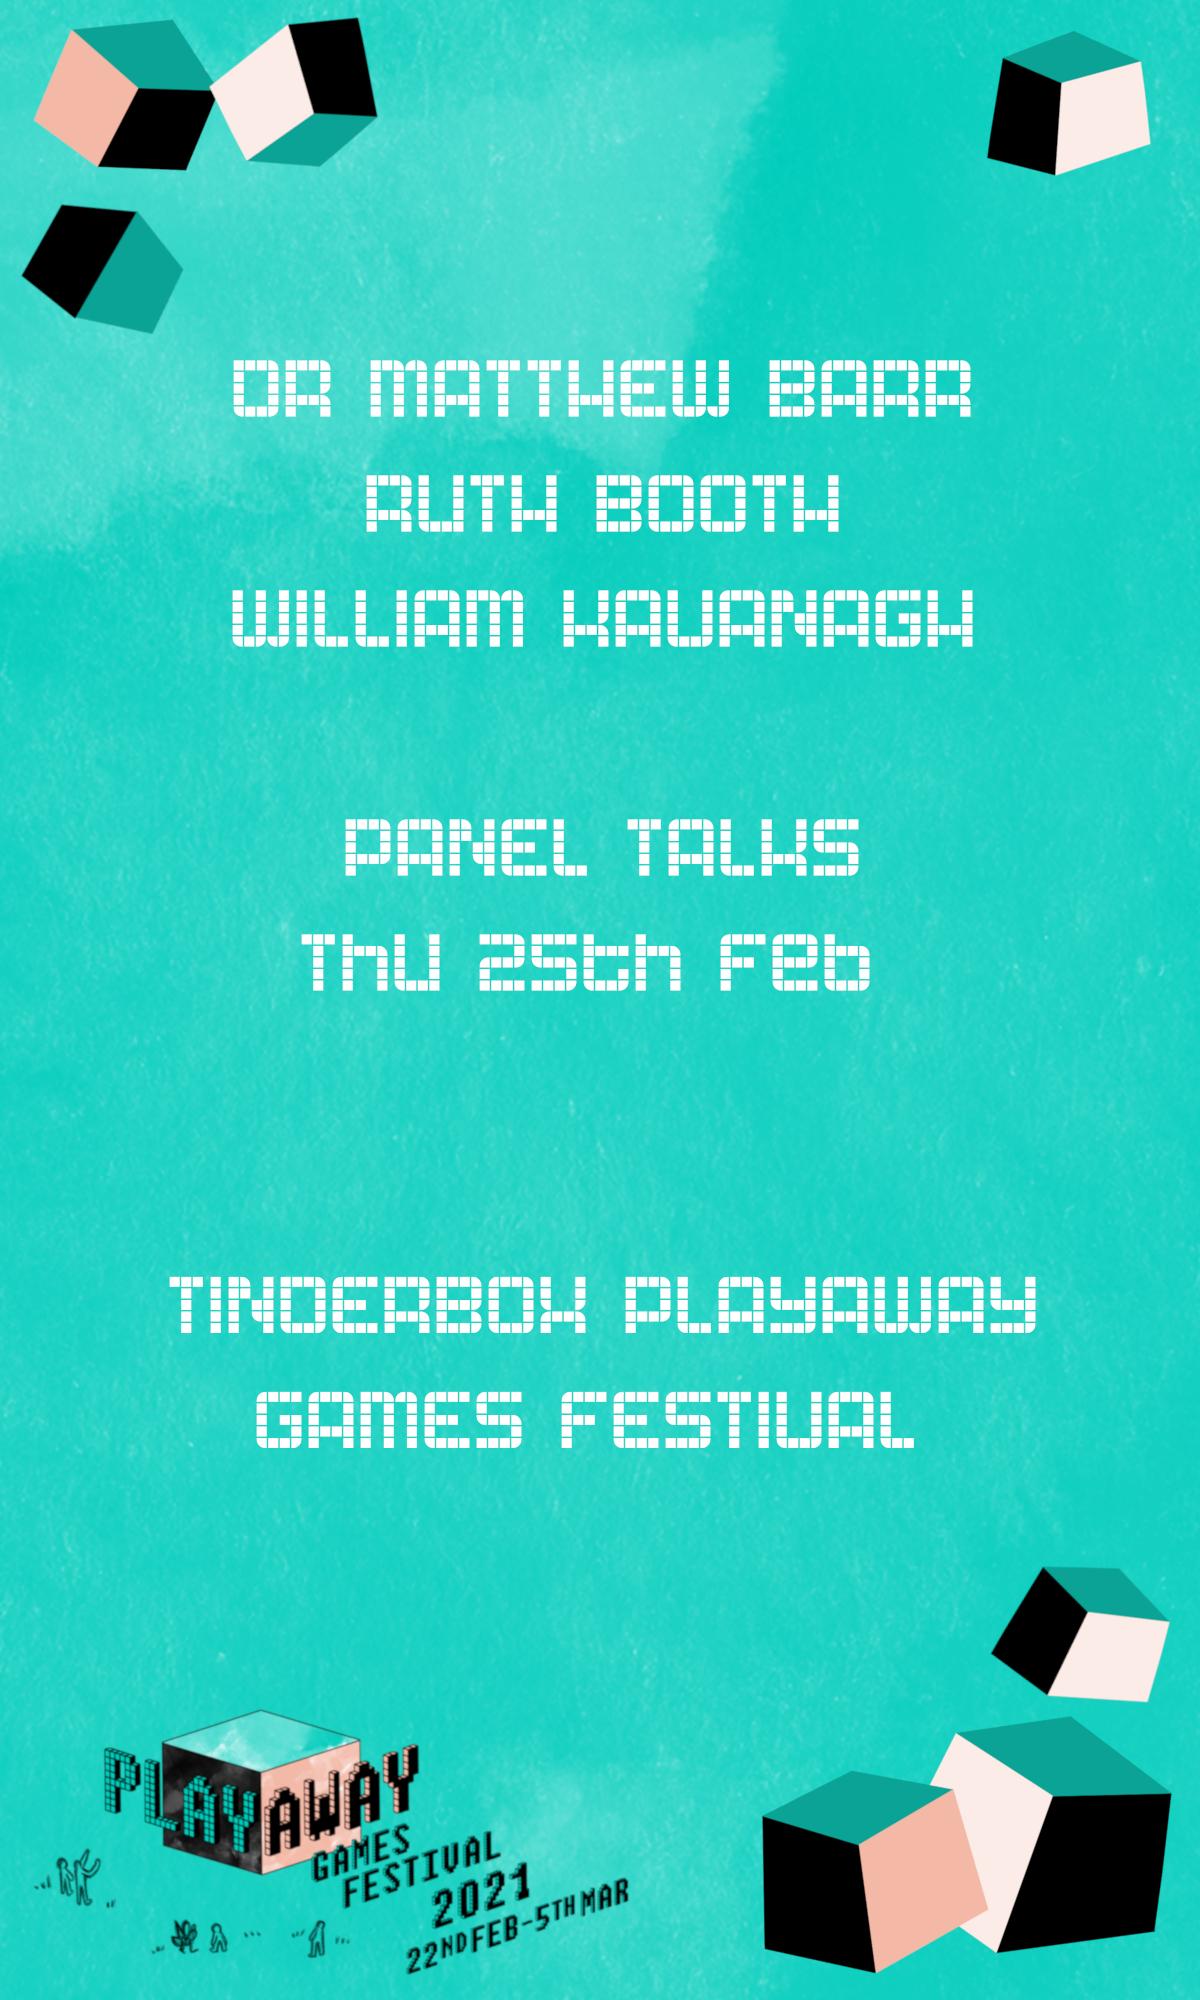 25thFebPanels_PlayAway_EventsGraphic